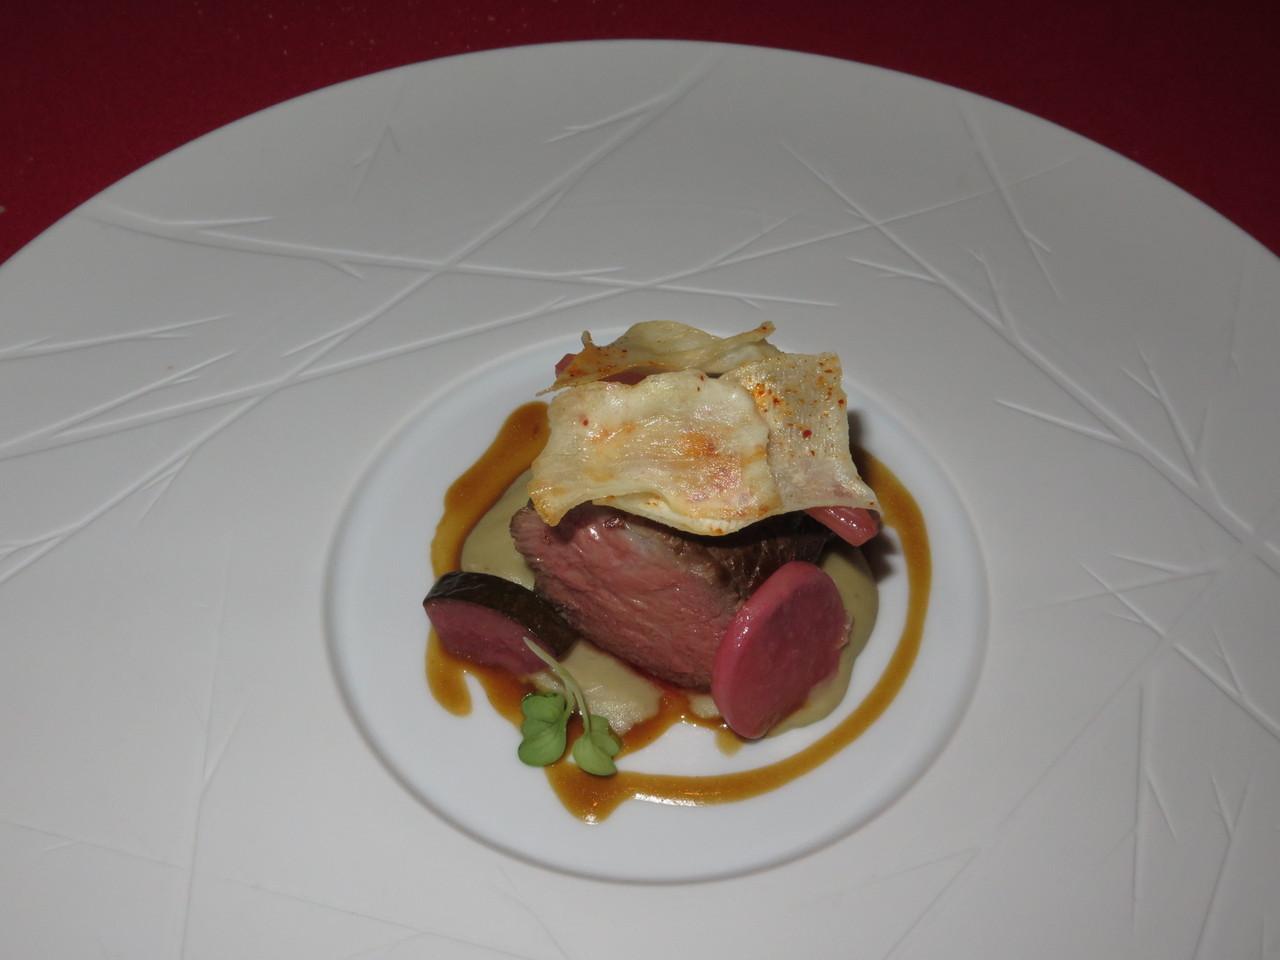 Bife marinado com soja, creme de beringela e legumes 'Carpione'